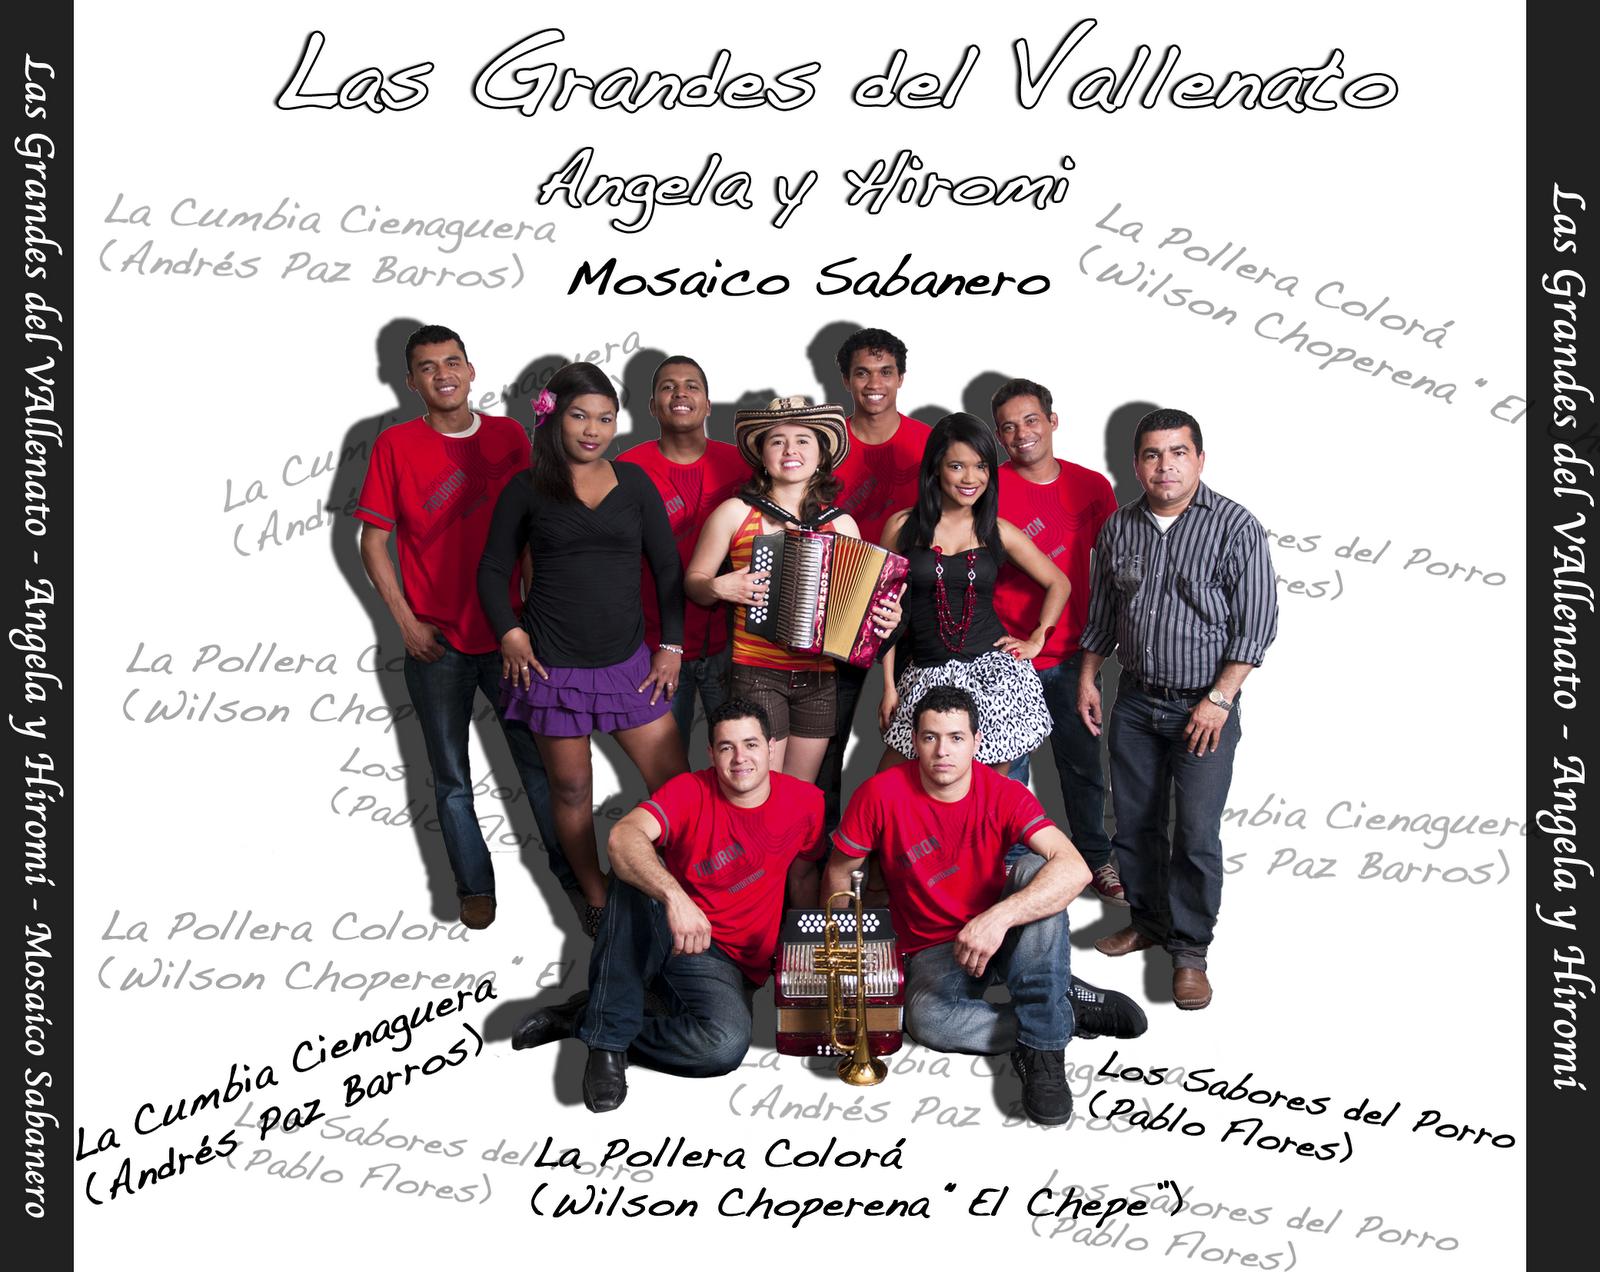 Los Vallenatos De La Cumbia williamhill services faq - MIX - YouTube